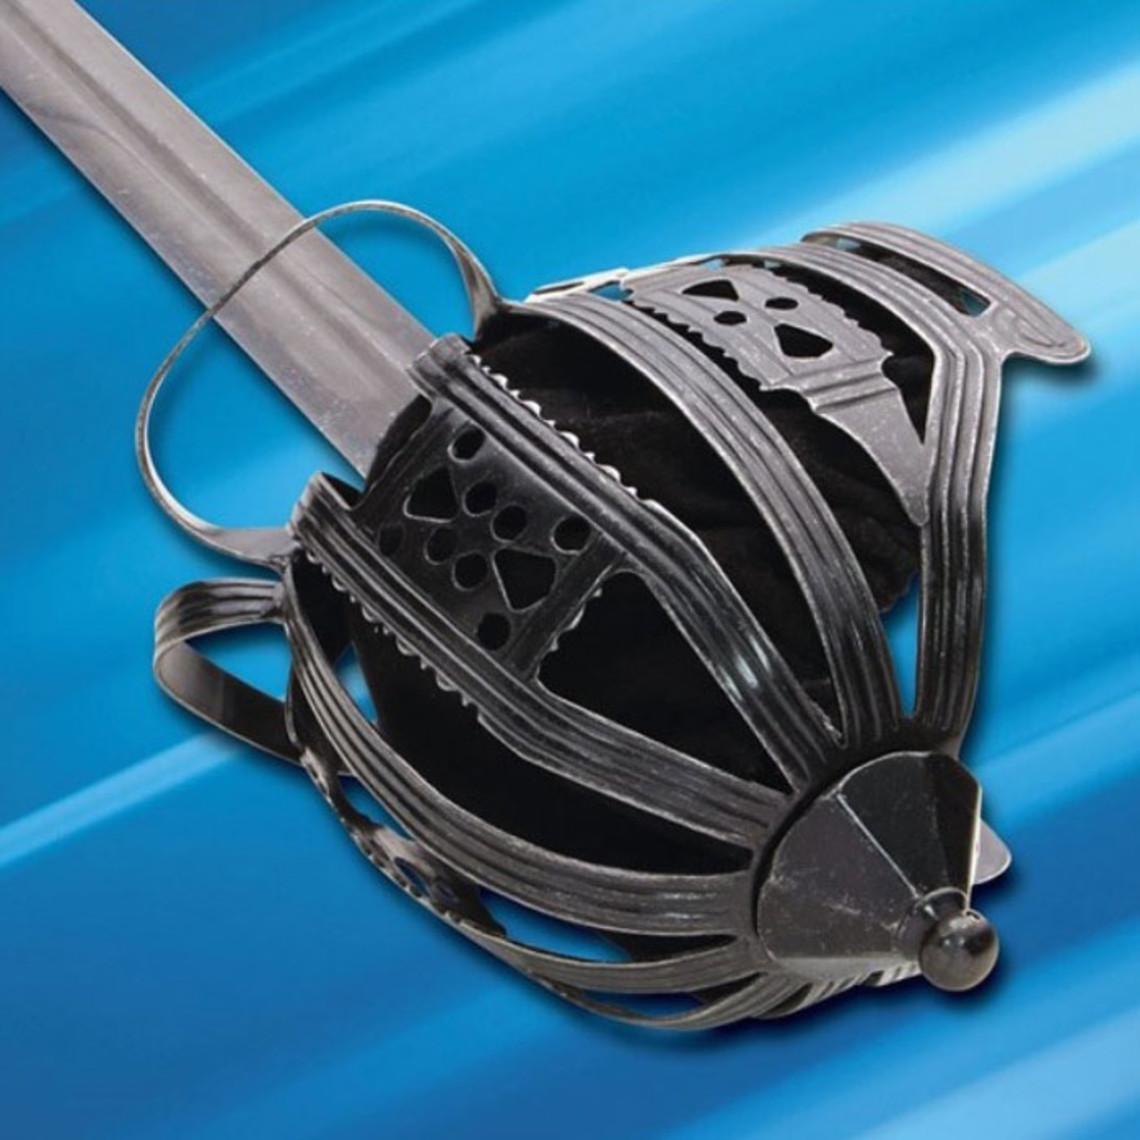 Windlass Steelcrafts Spada a manico scozzese scozzese Culloden